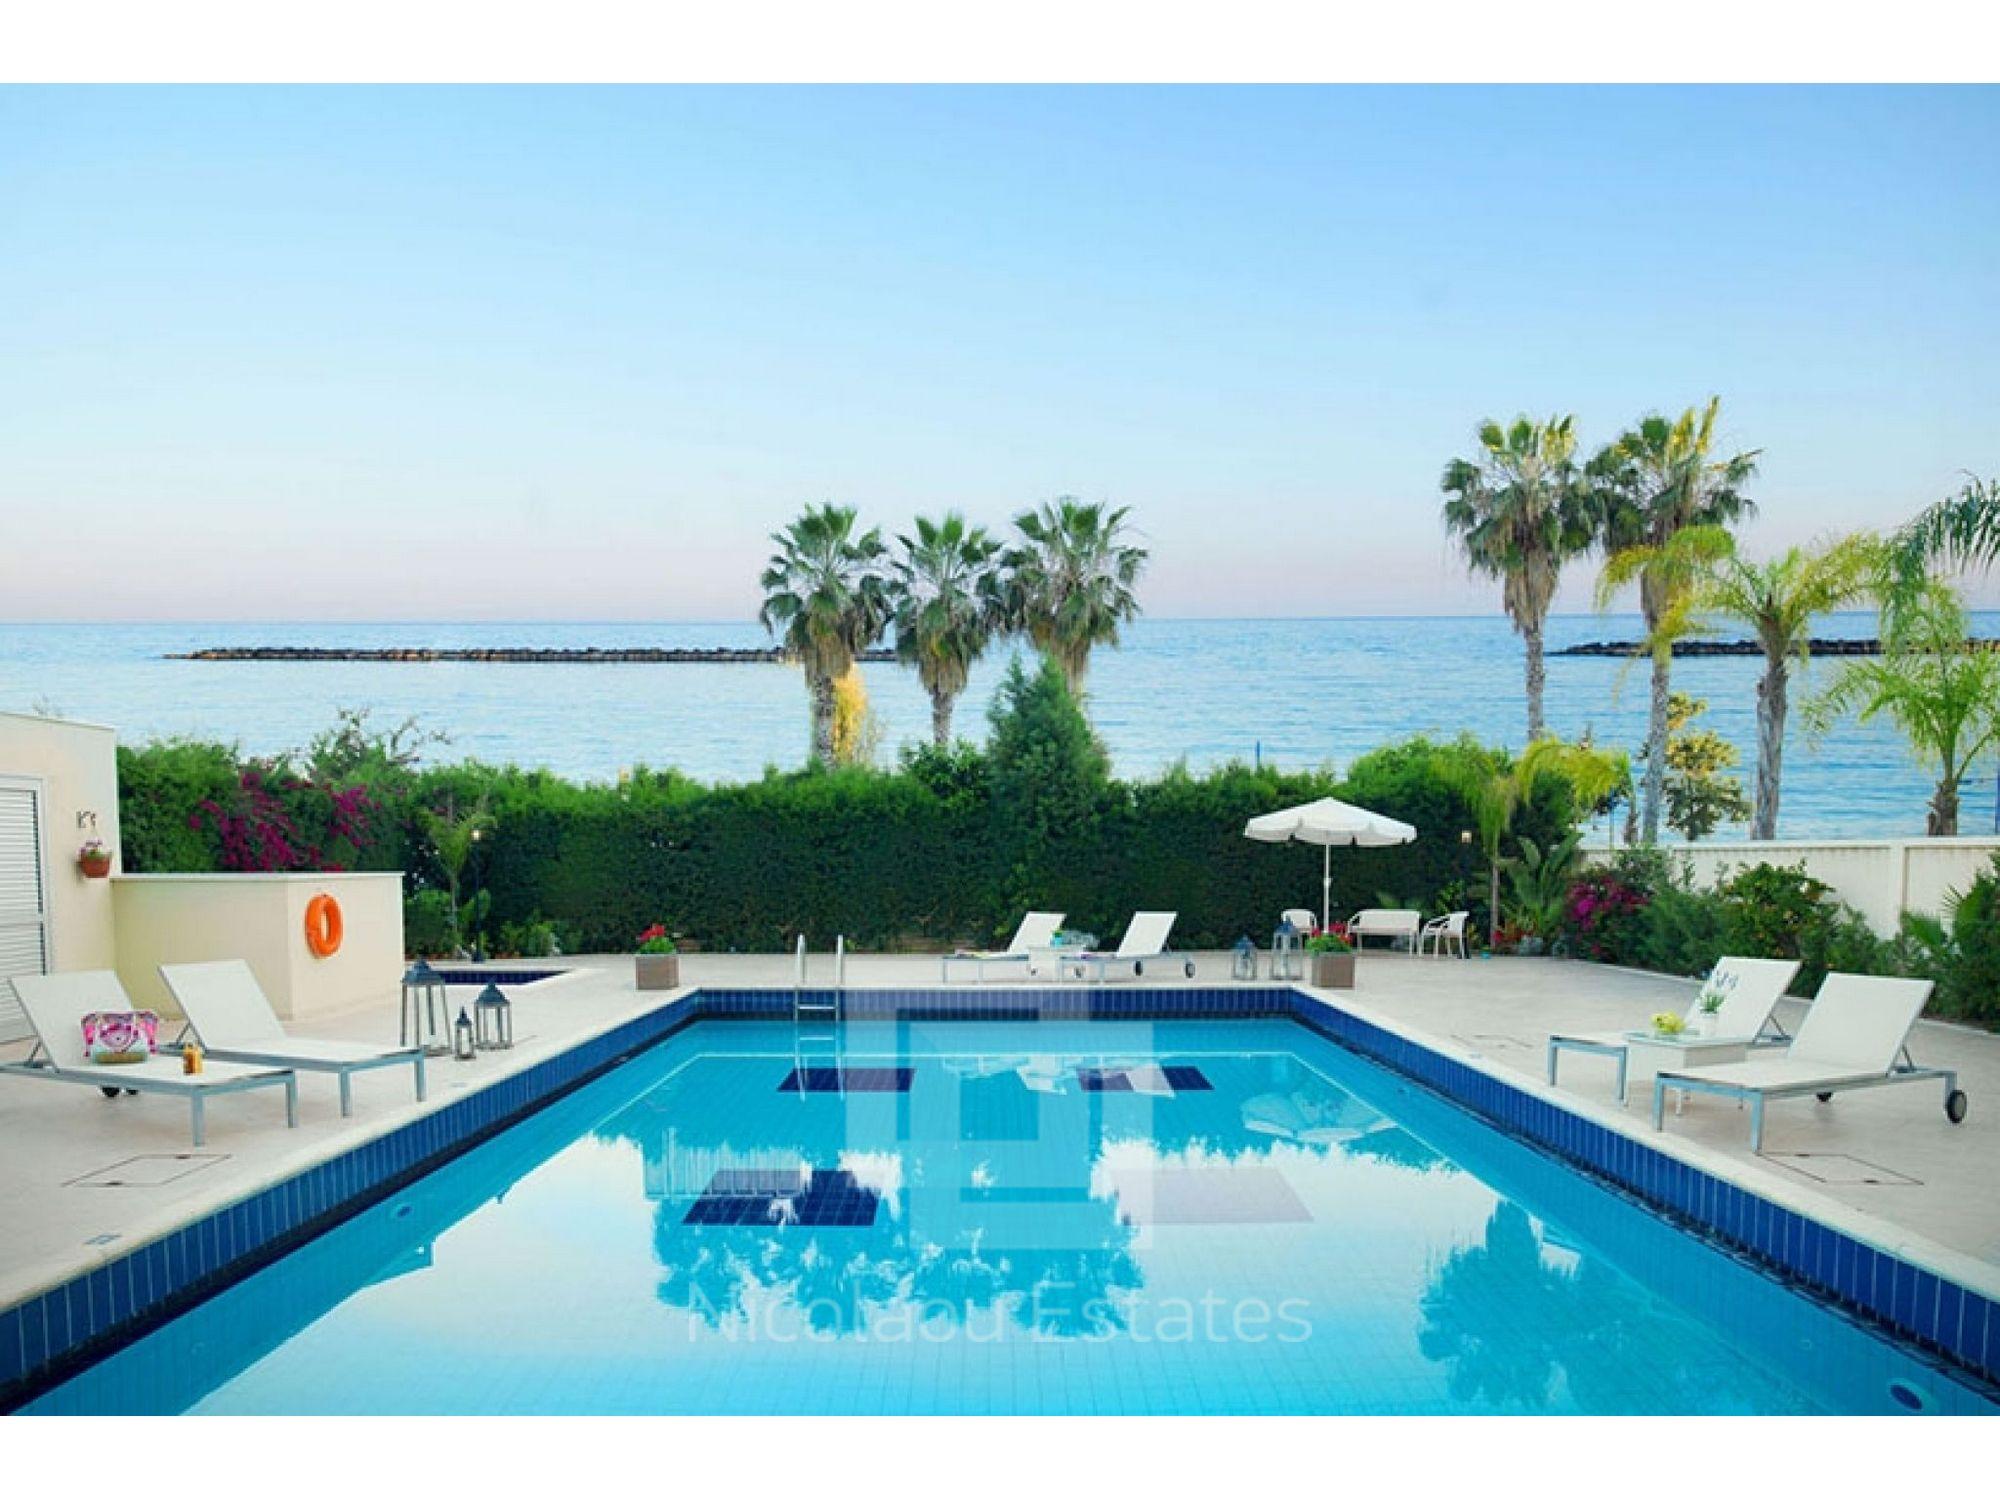 For Rent - Luxury Ground floor garden flat opposite the beach with ...